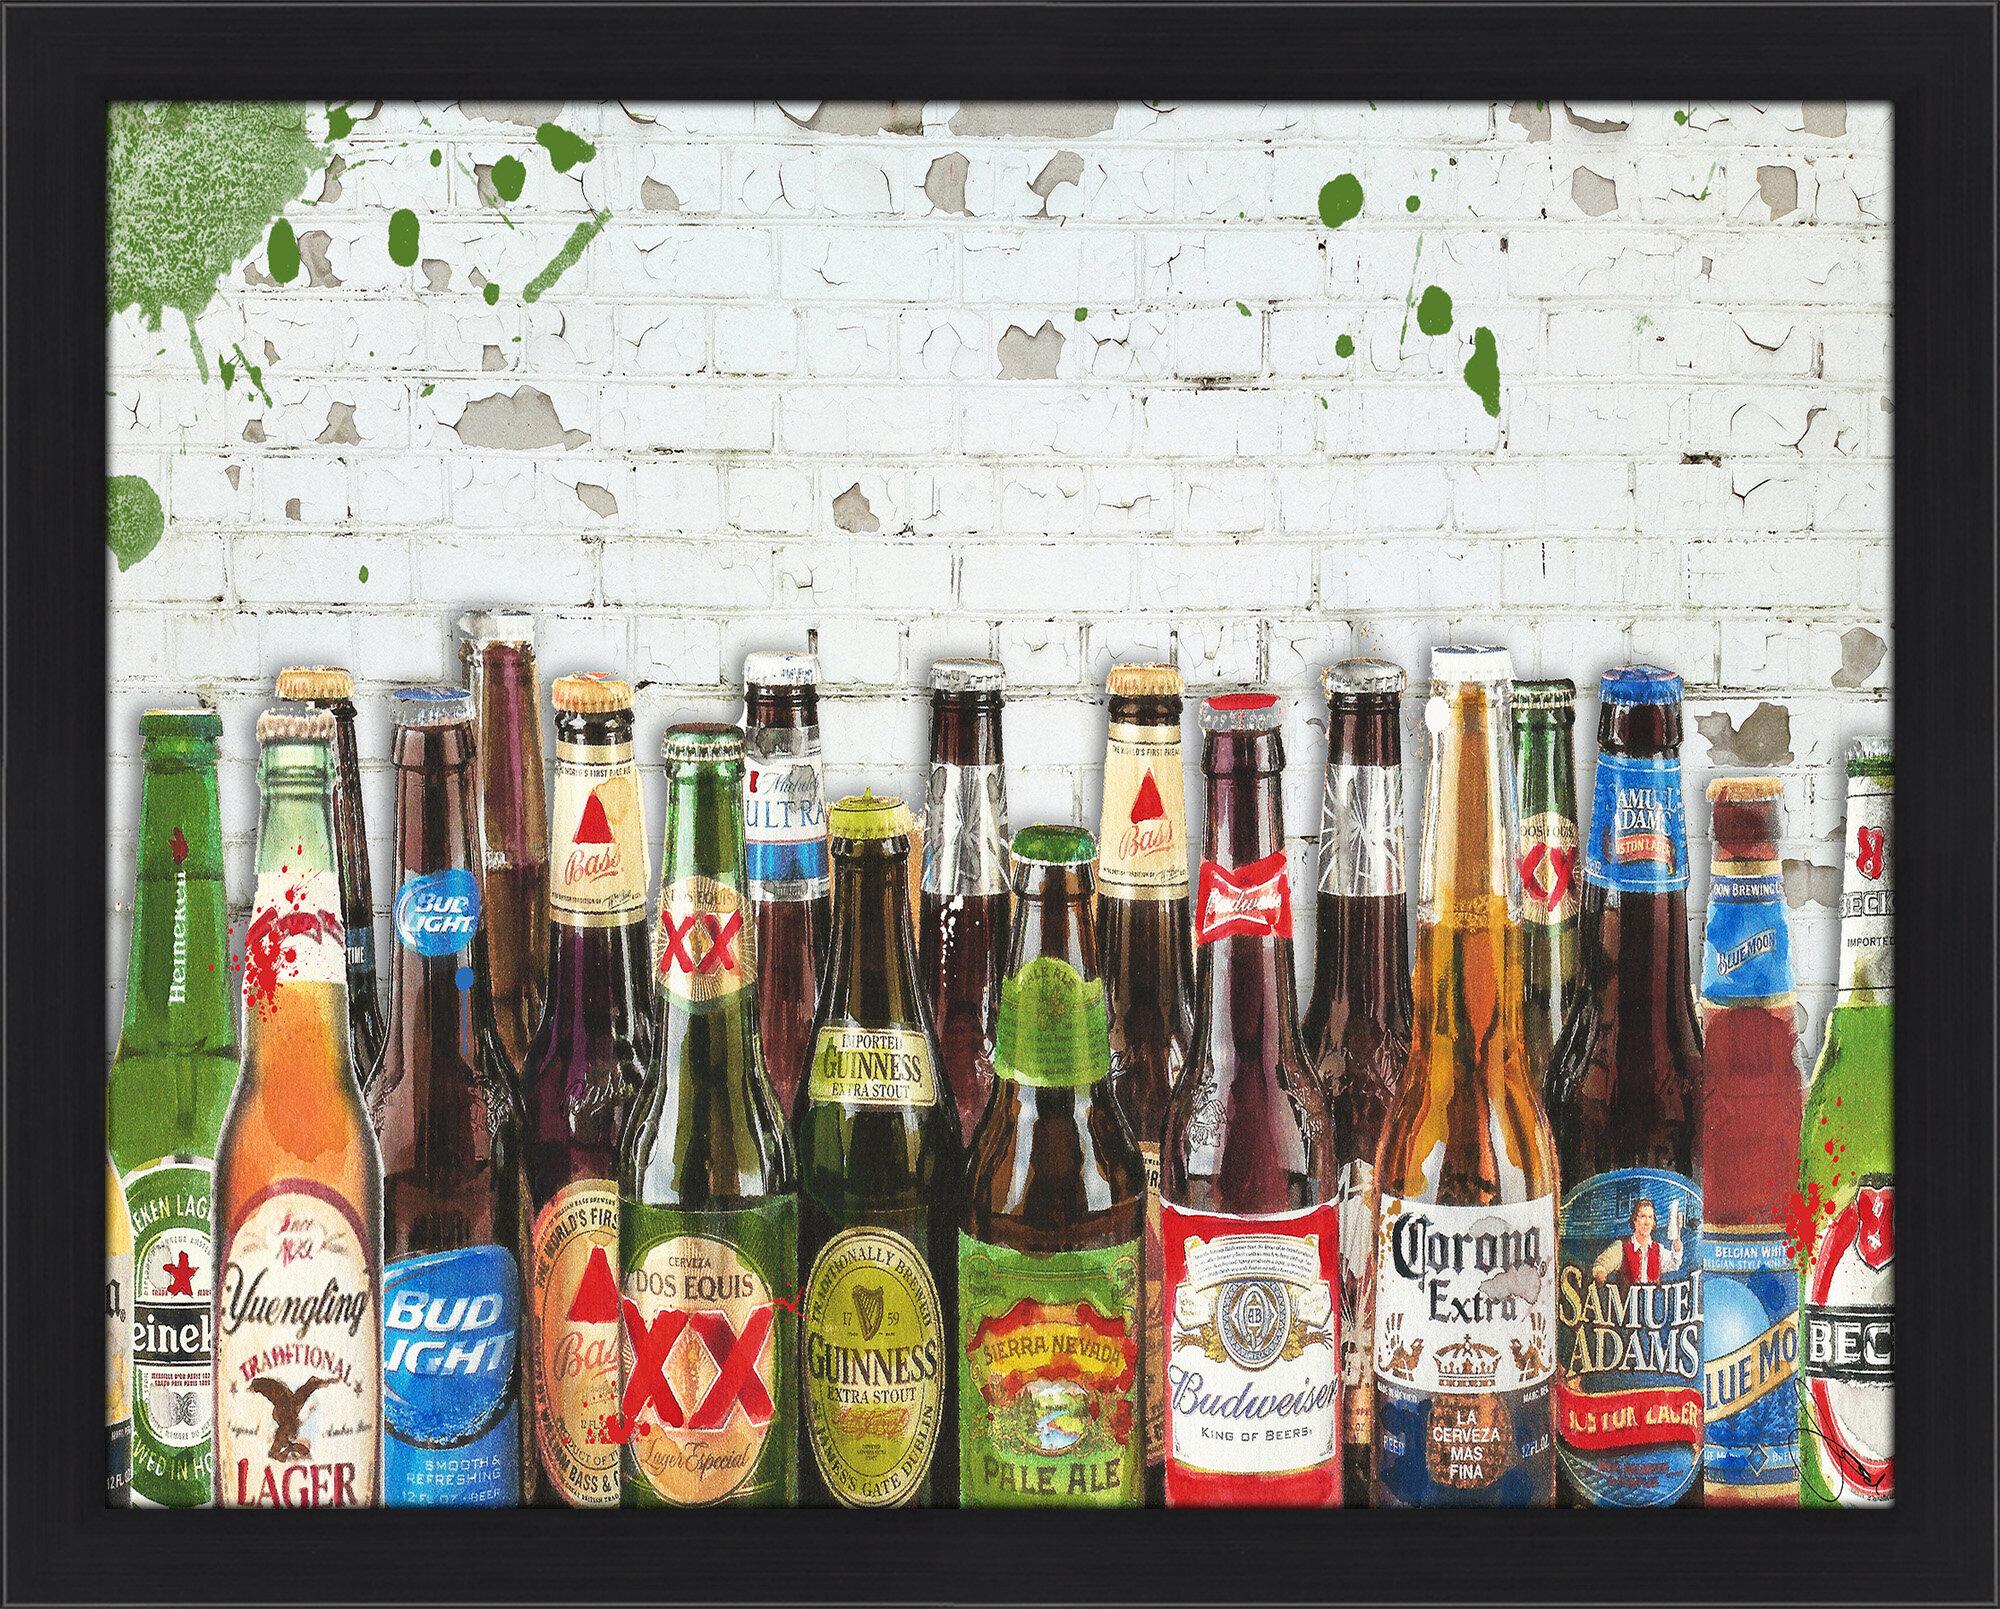 PicturePerfectInternational 99 Bottles Of Beer Graphic Art Print